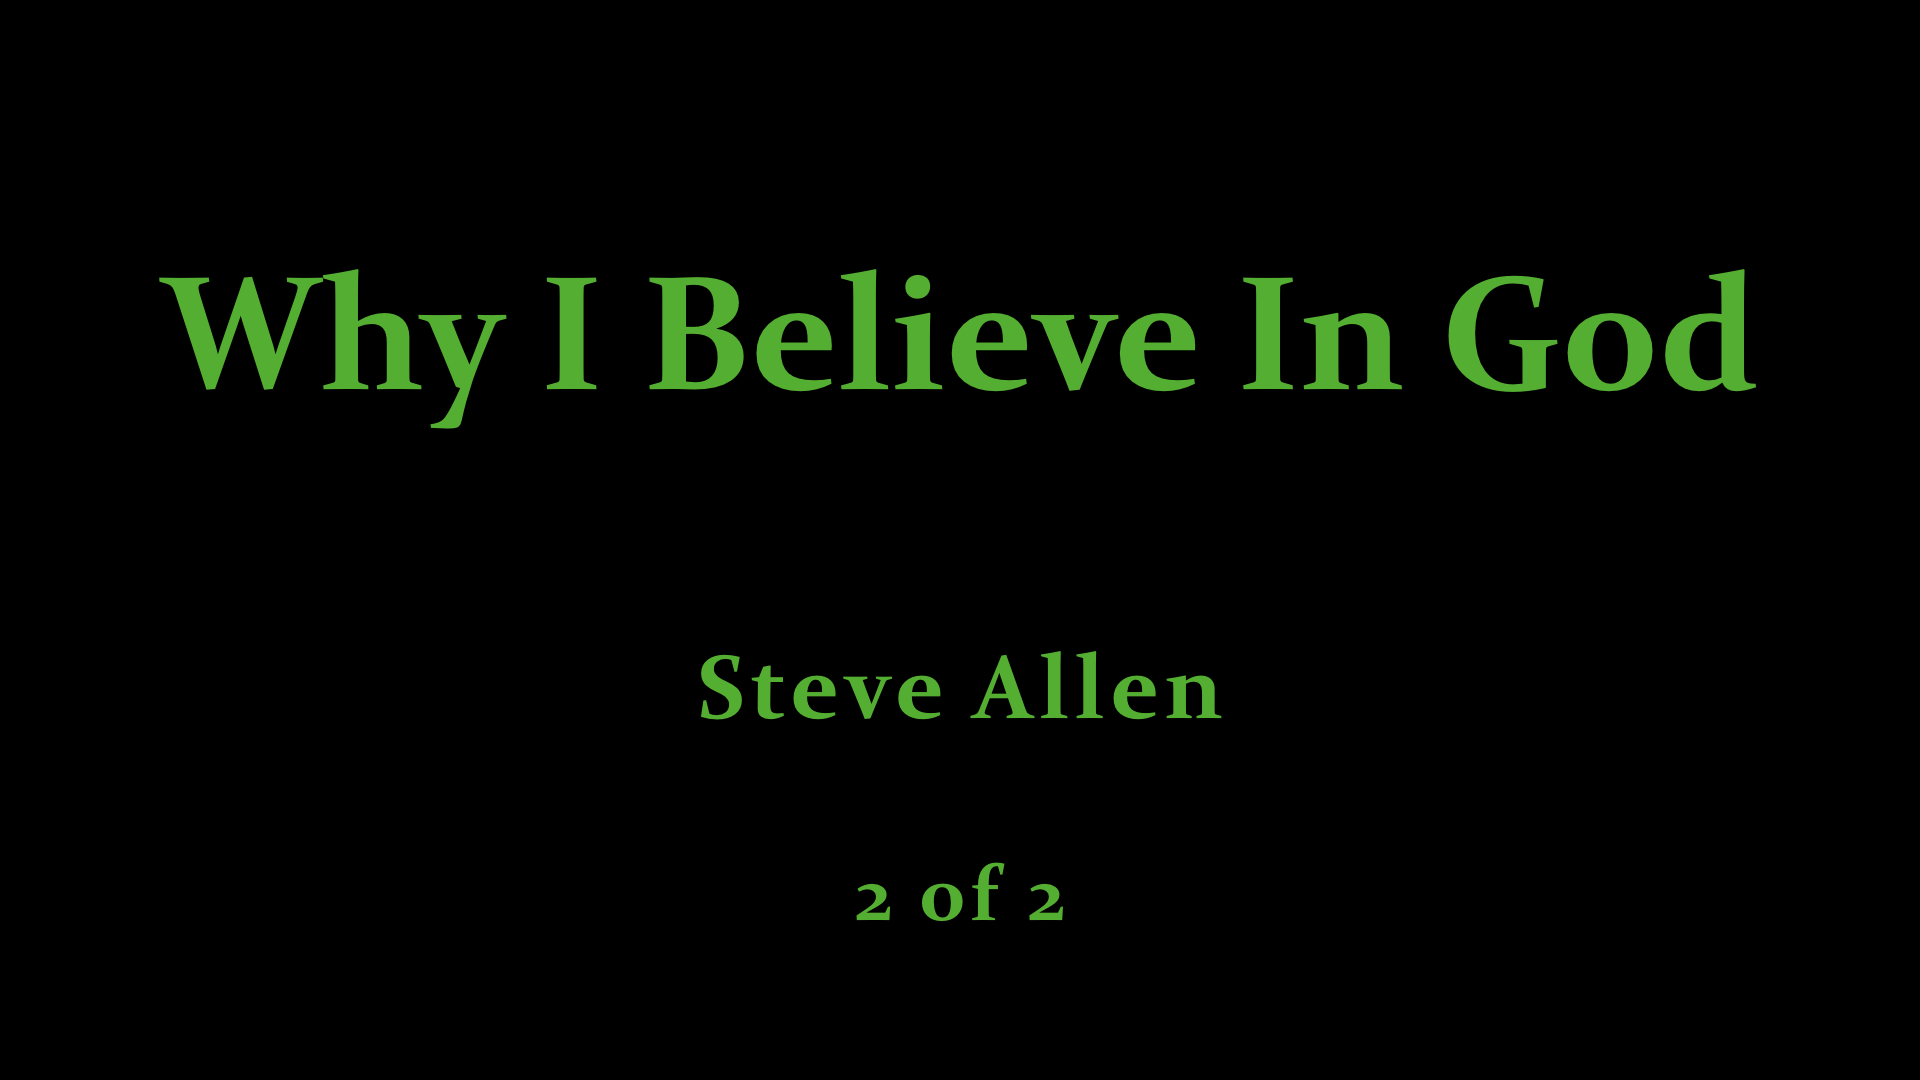 Steve Allen - Why I Believe In God (2 of 2).jpeg